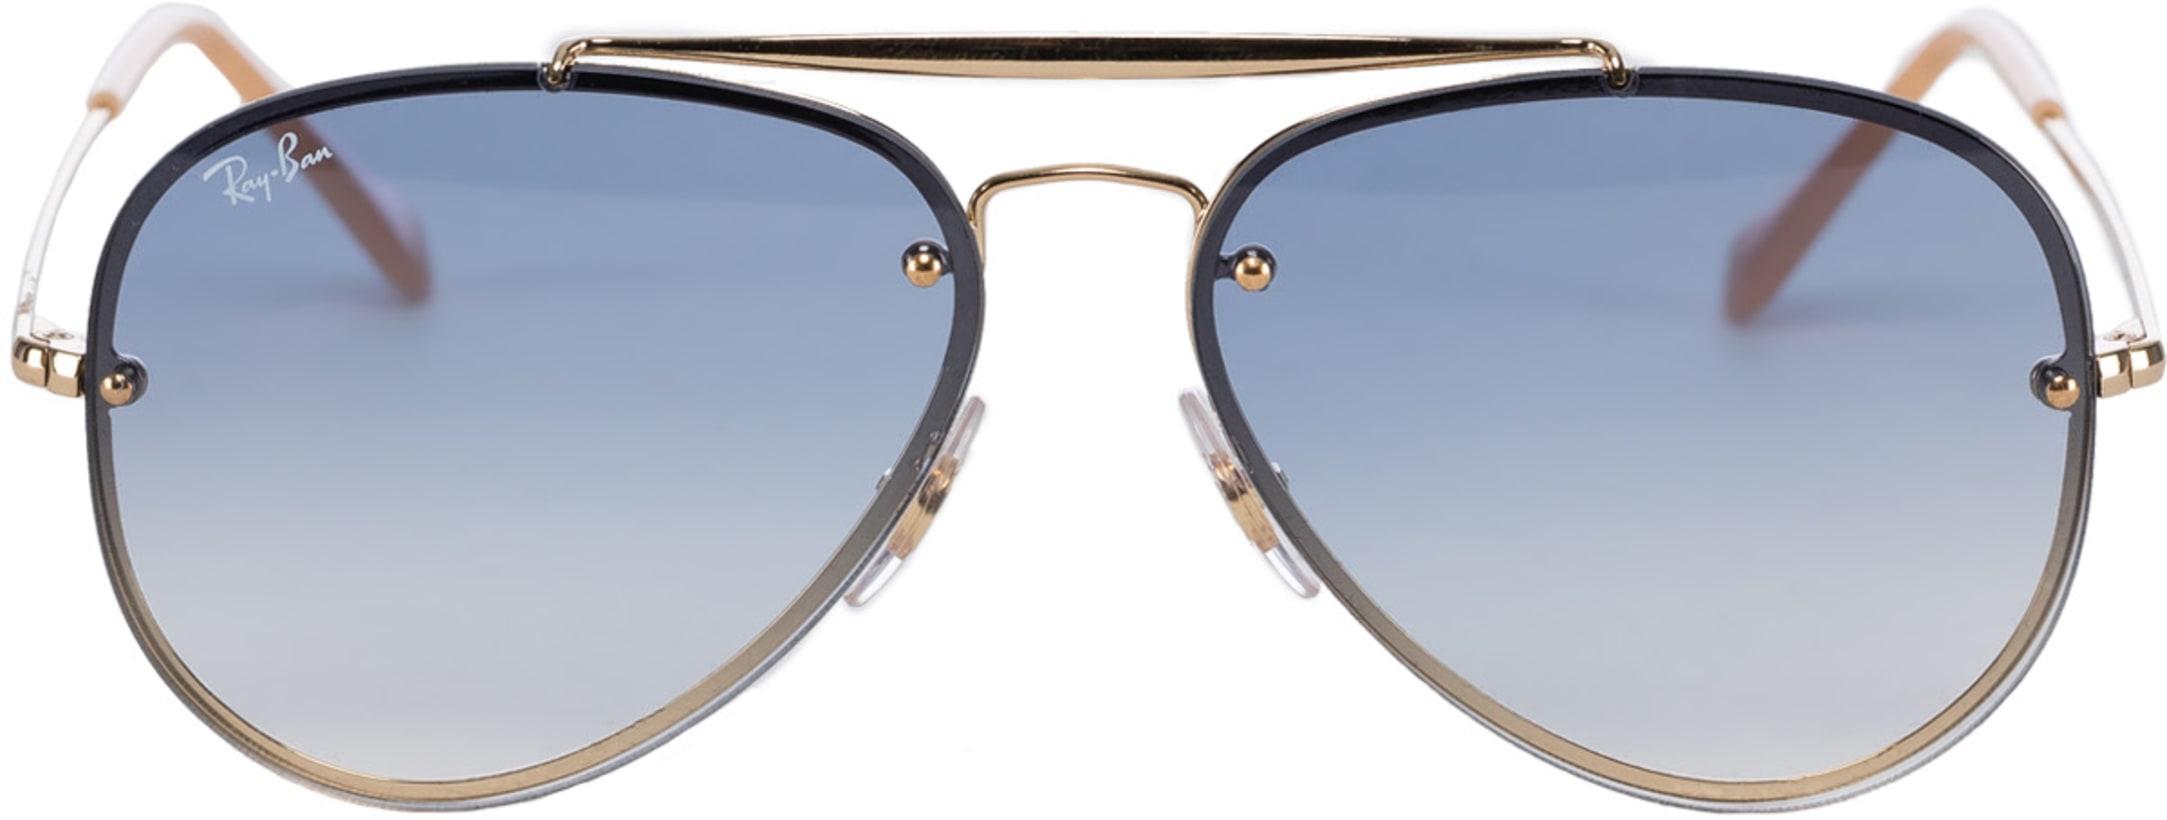 32031bf30a Ray-Ban  Blaze Aviator Sunglasses - Gold Light Blue Gradient ...